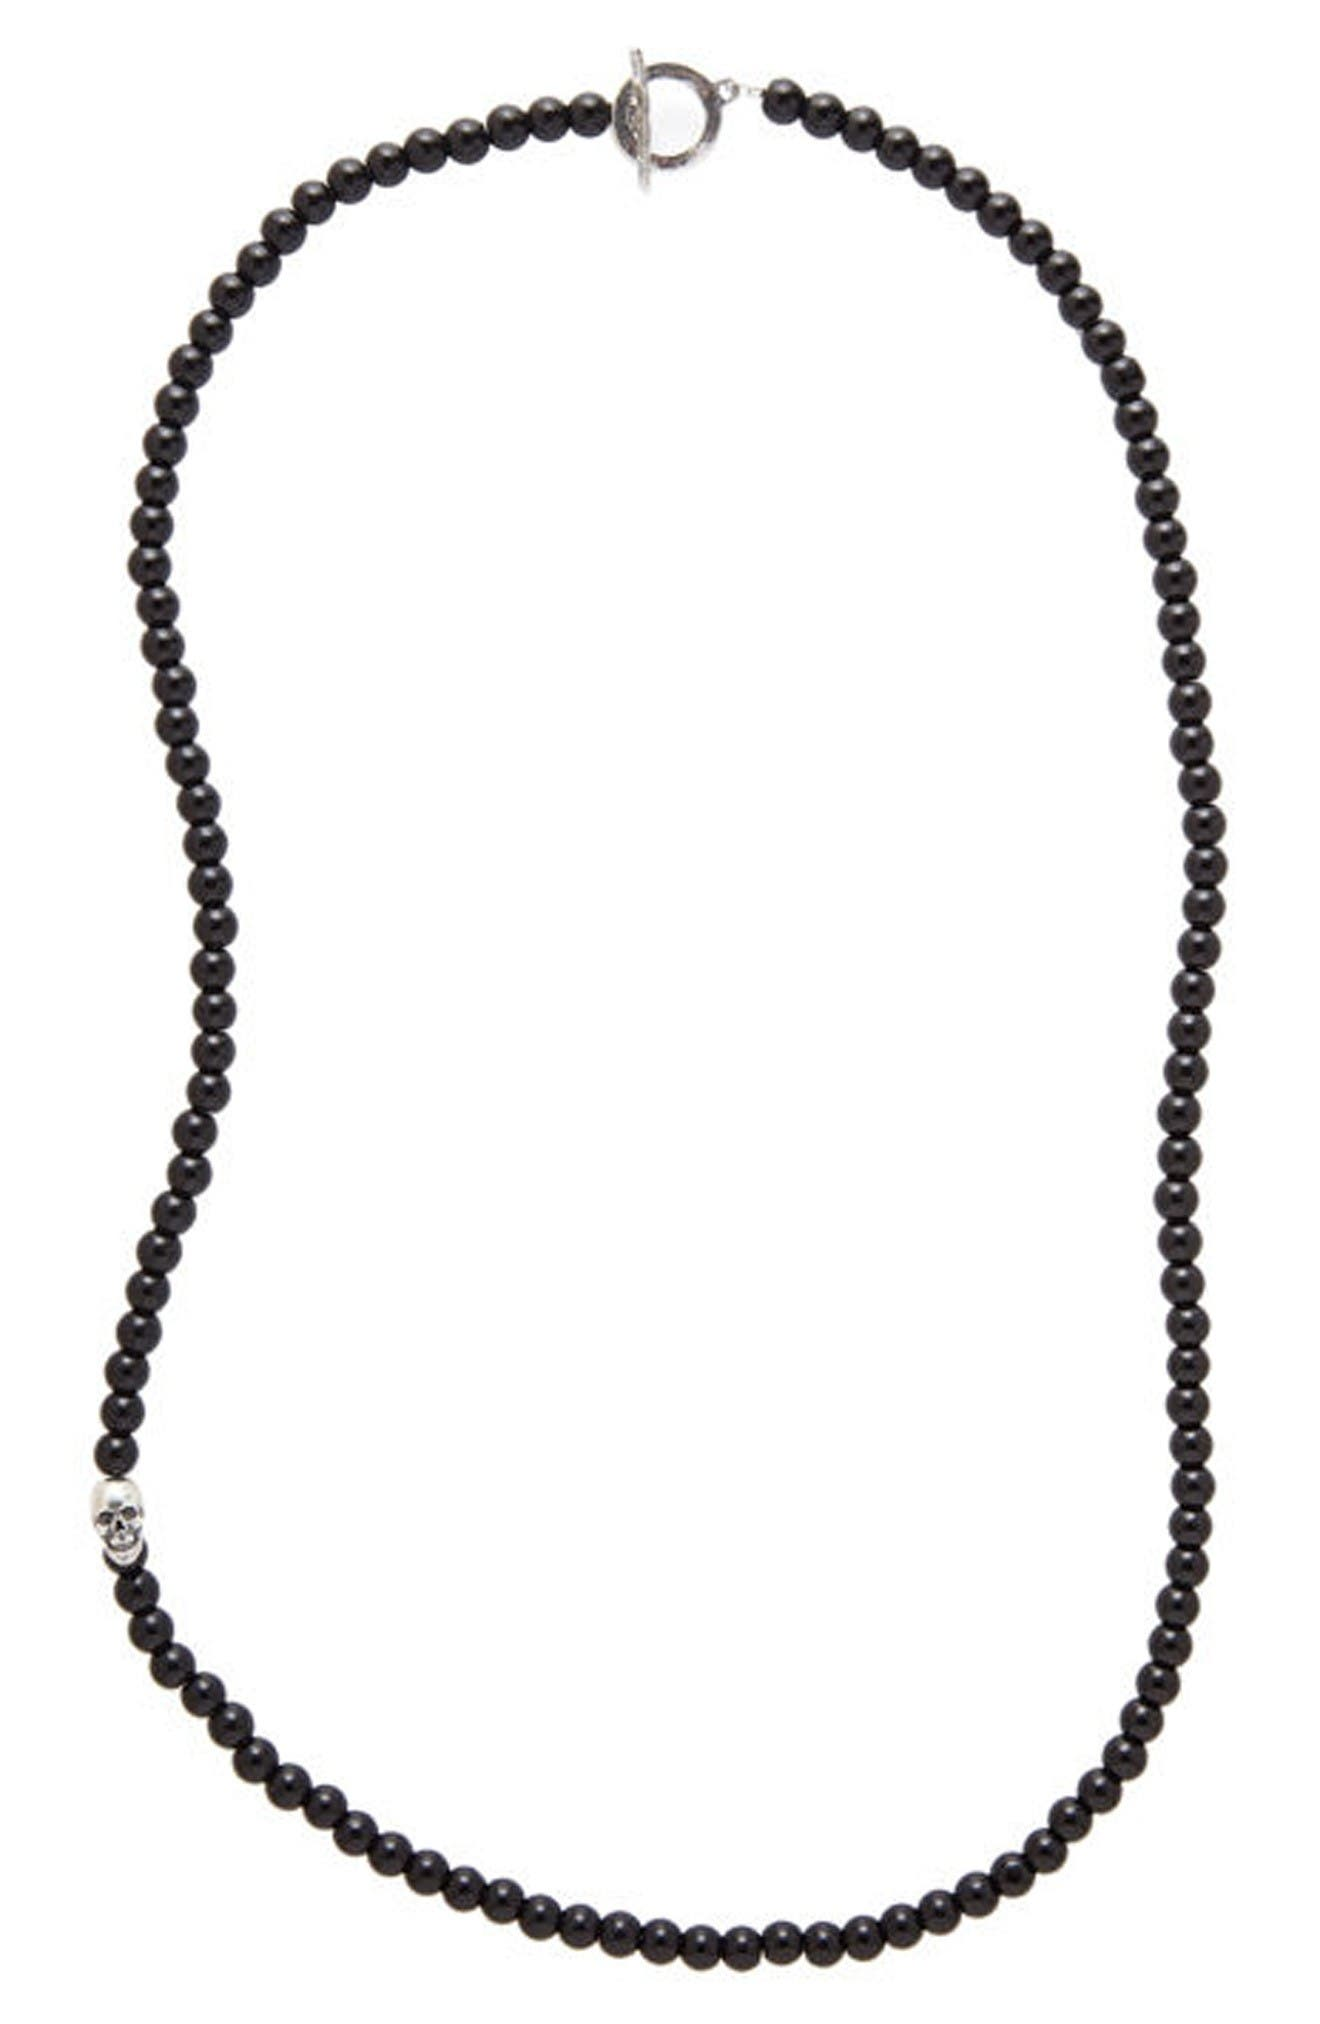 Alternate Image 1 Selected - Degs & Sal Onyx Bead Necklace